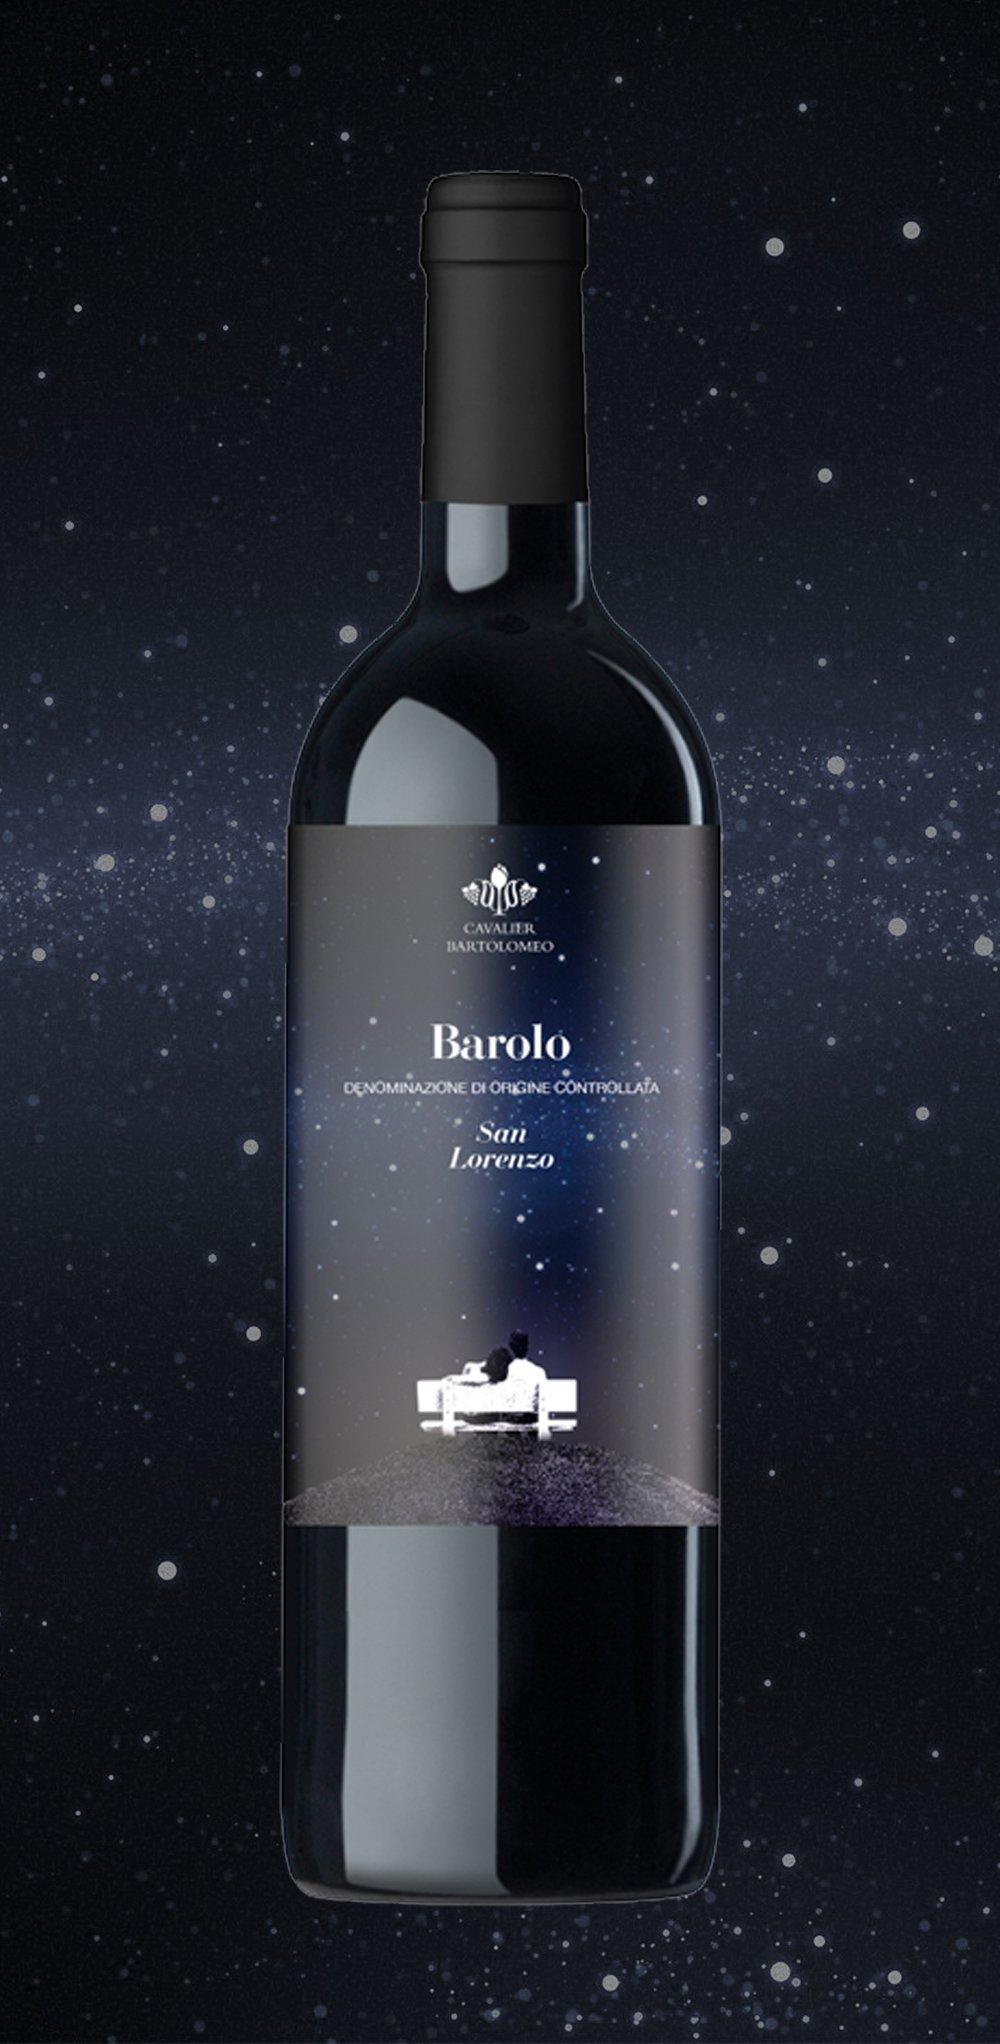 Cavalier Bartolomeo | Barolo San Lorenzo